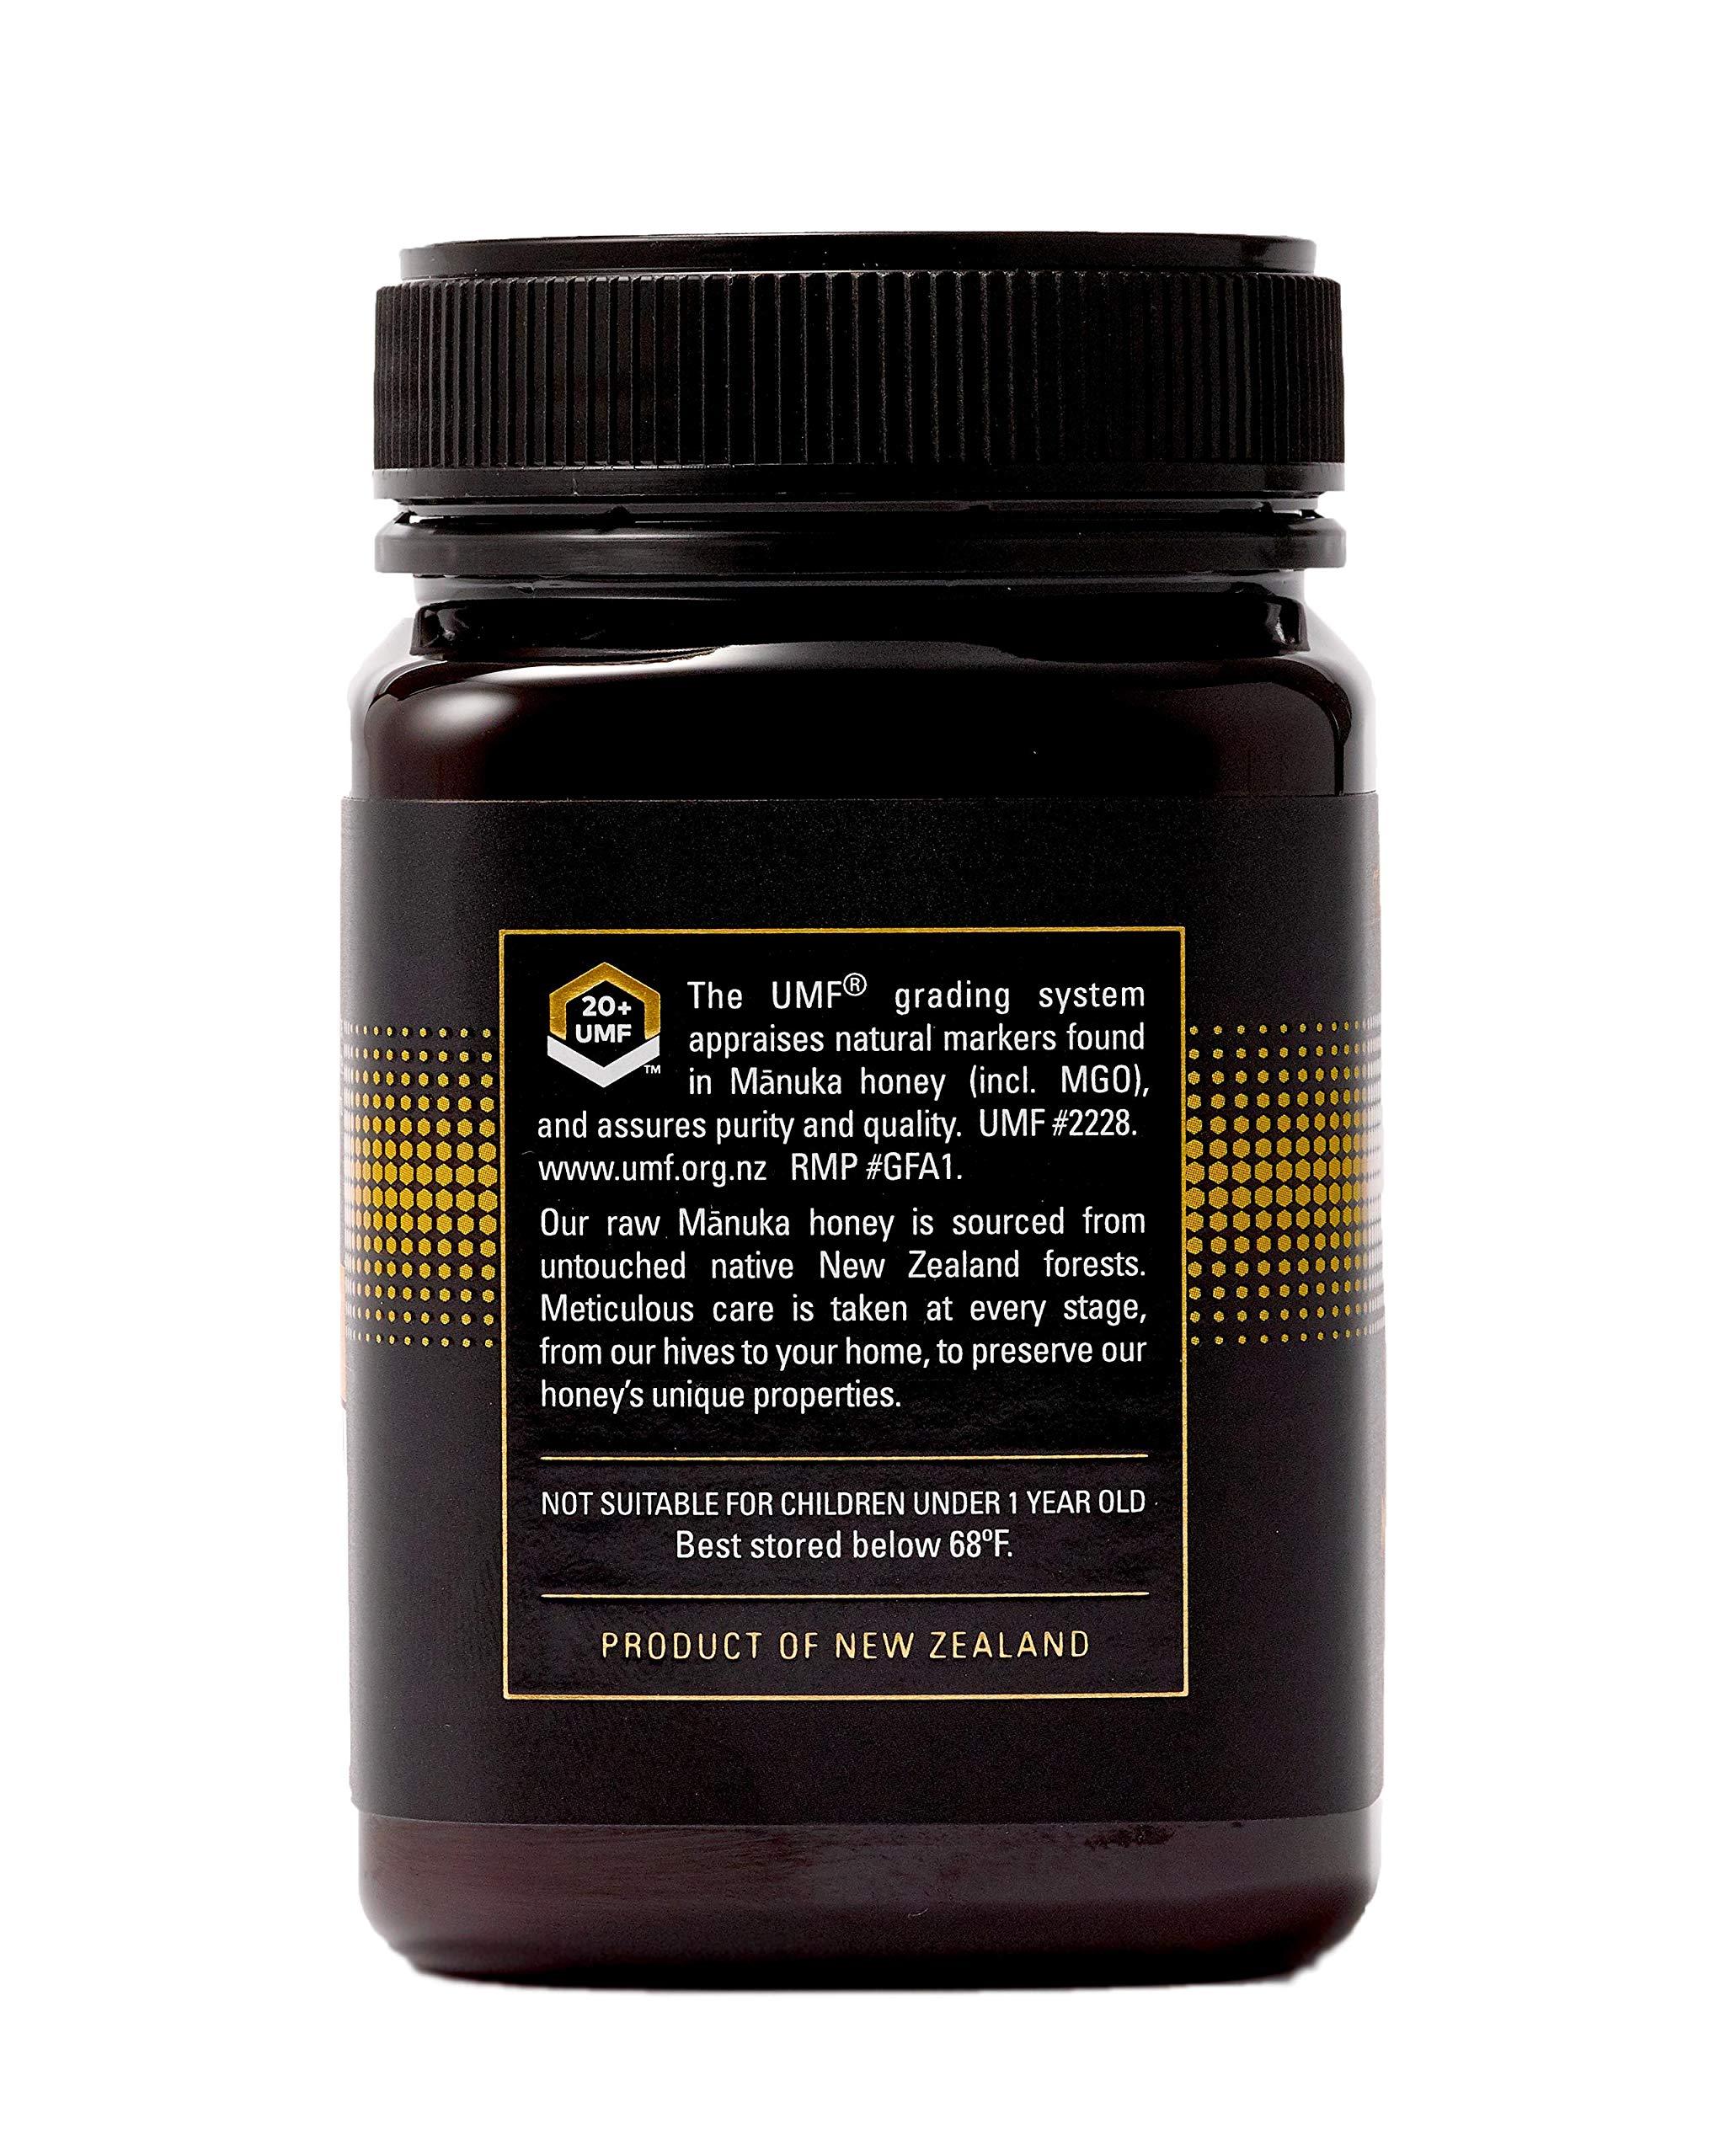 Manukora UMF 20+/MGO 830+ Raw Mānuka Honey (500g/1.1lb) Authentic Non-GMO New Zealand Honey, UMF & MGO Certified, Traceable from Hive to Hand by Manukora (Image #4)